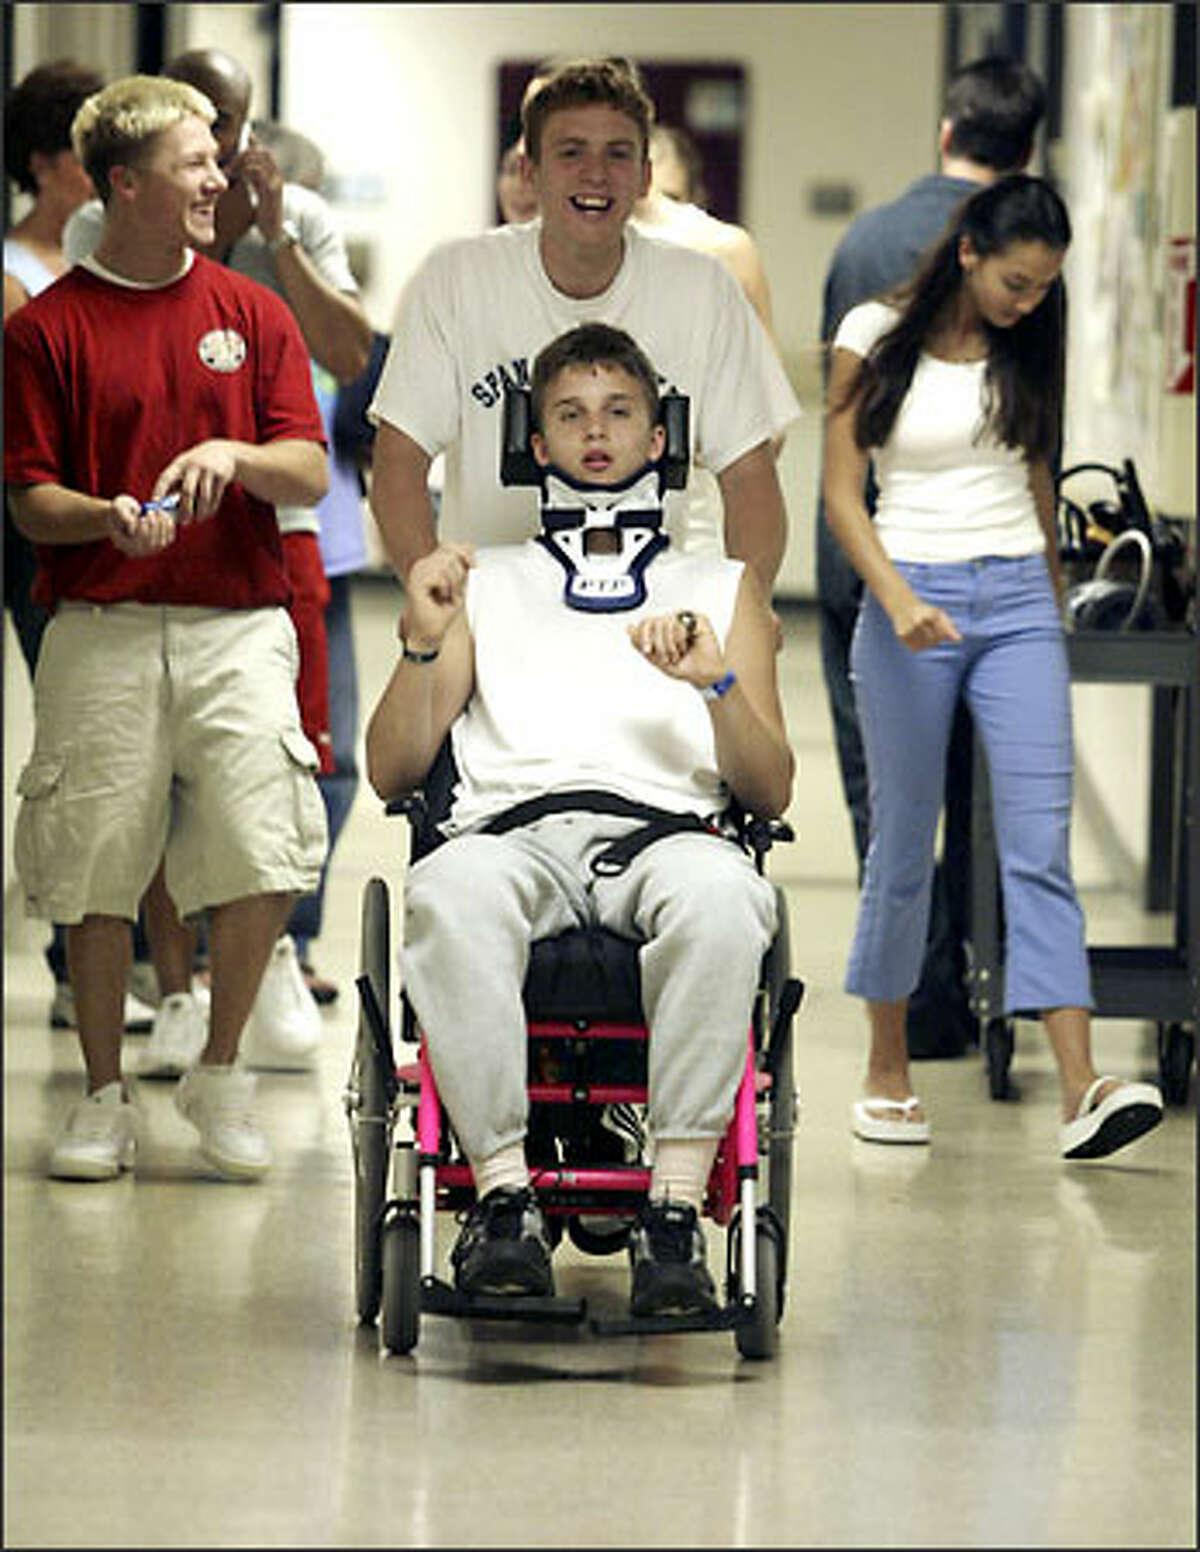 Spanaway Lakes teammate Steven Easterly gives Logan Seelye a push back to his room at Good Samaritan Hospital after rehab treatments.